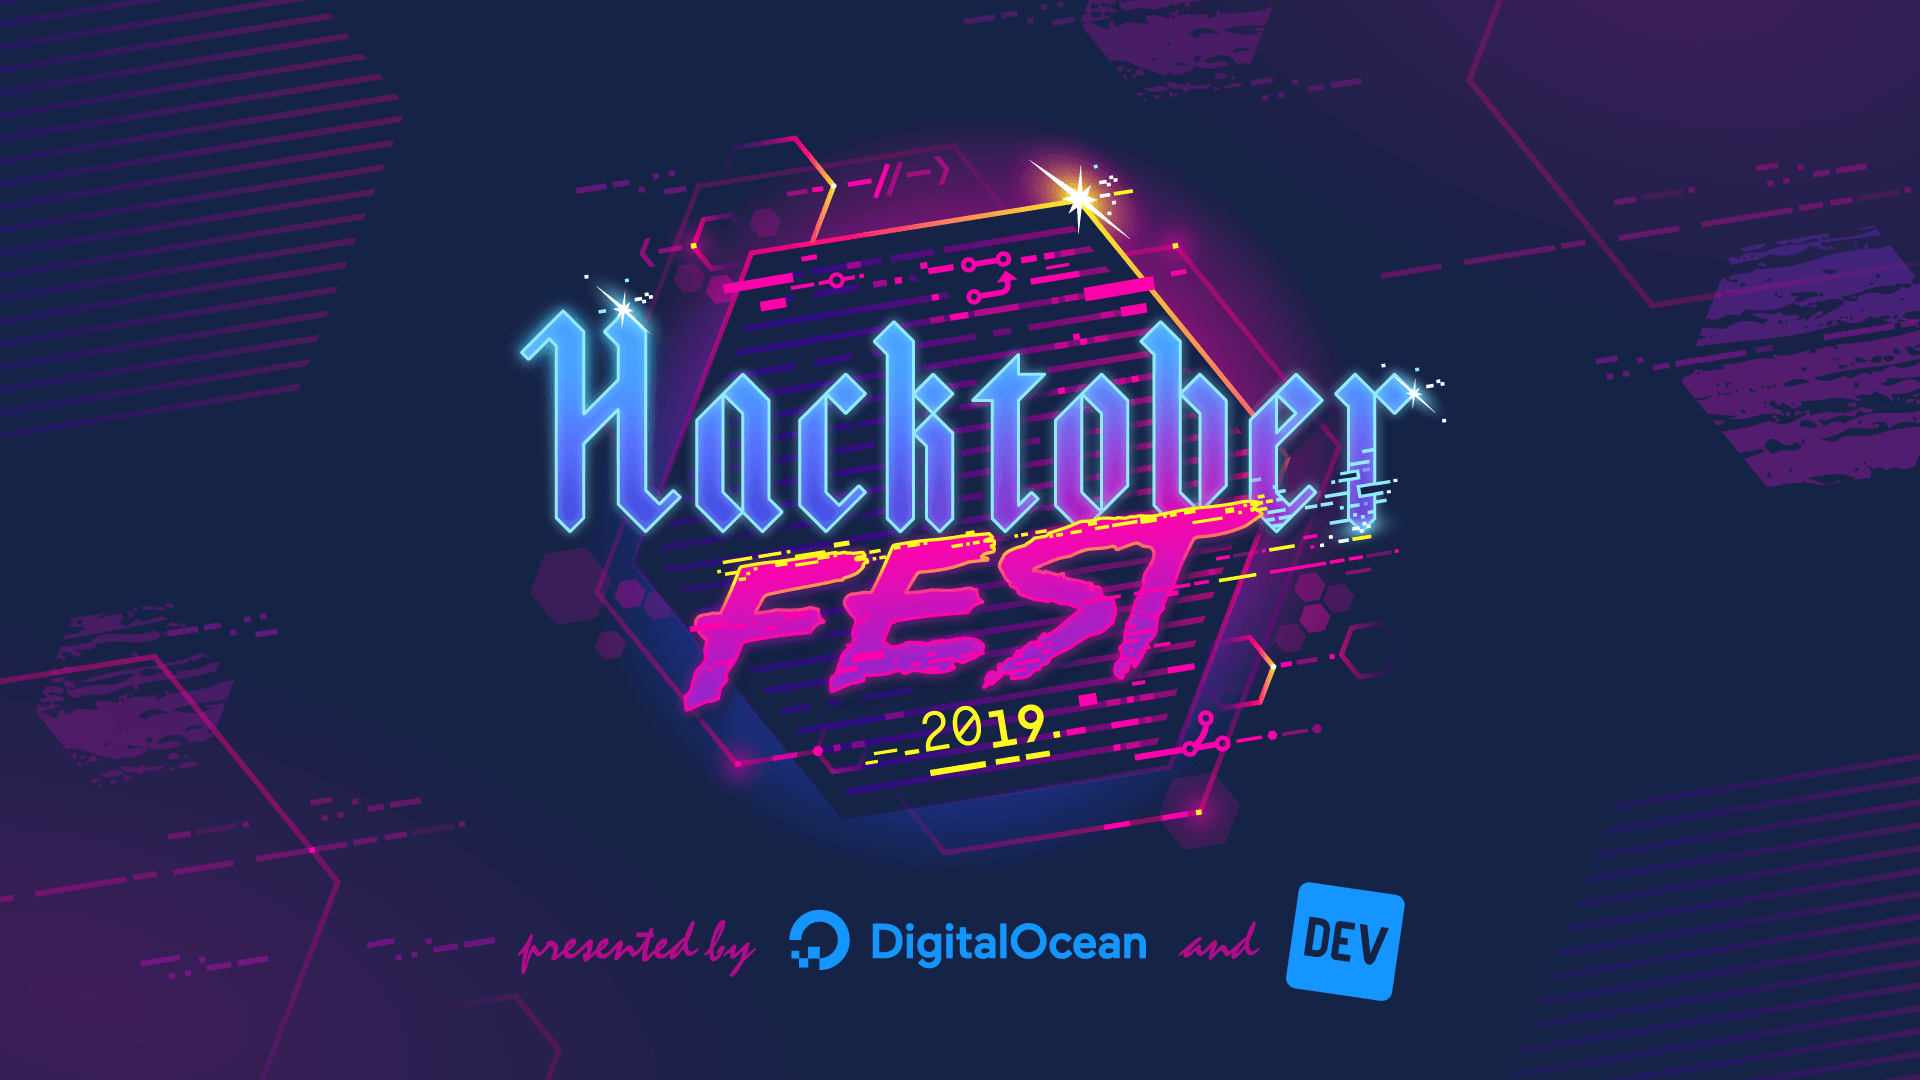 Hacktoberfest-2019_fedorafans.com